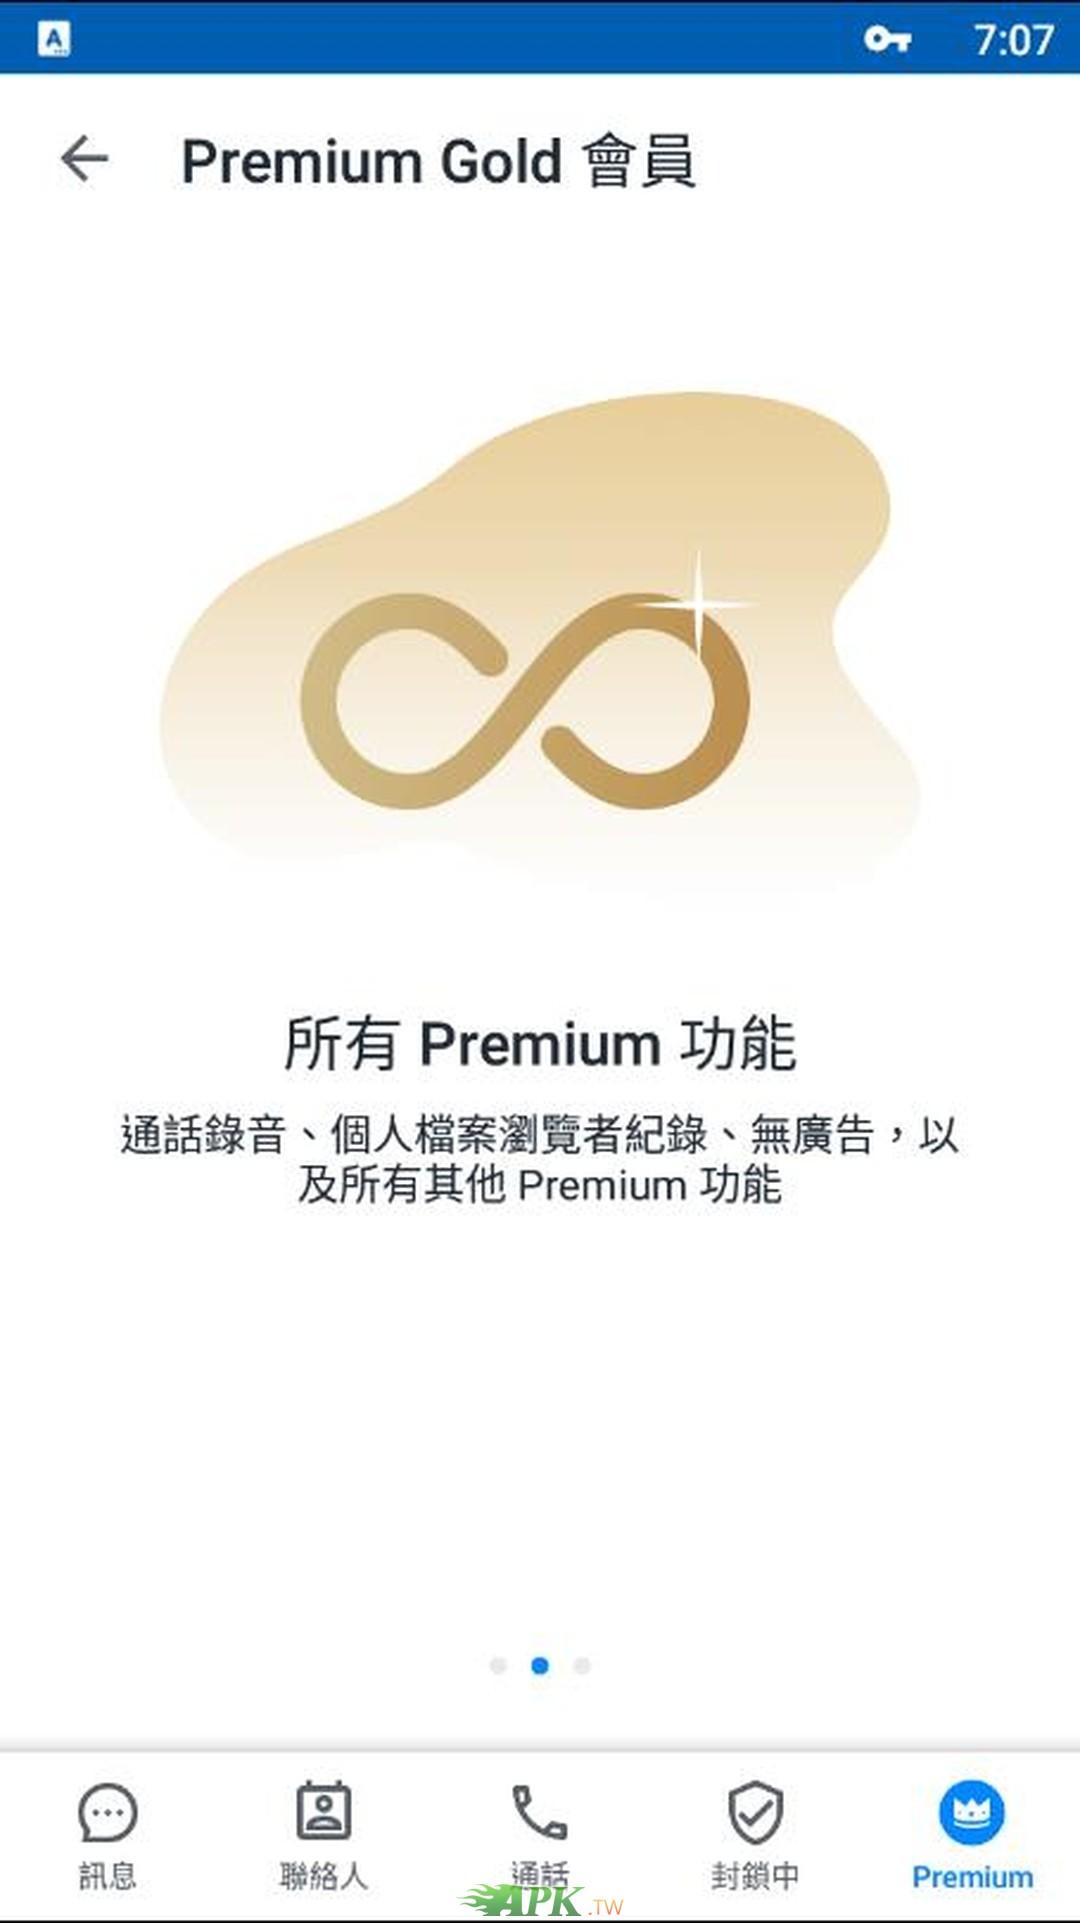 Truecaller_Premium_4_Gold.jpg